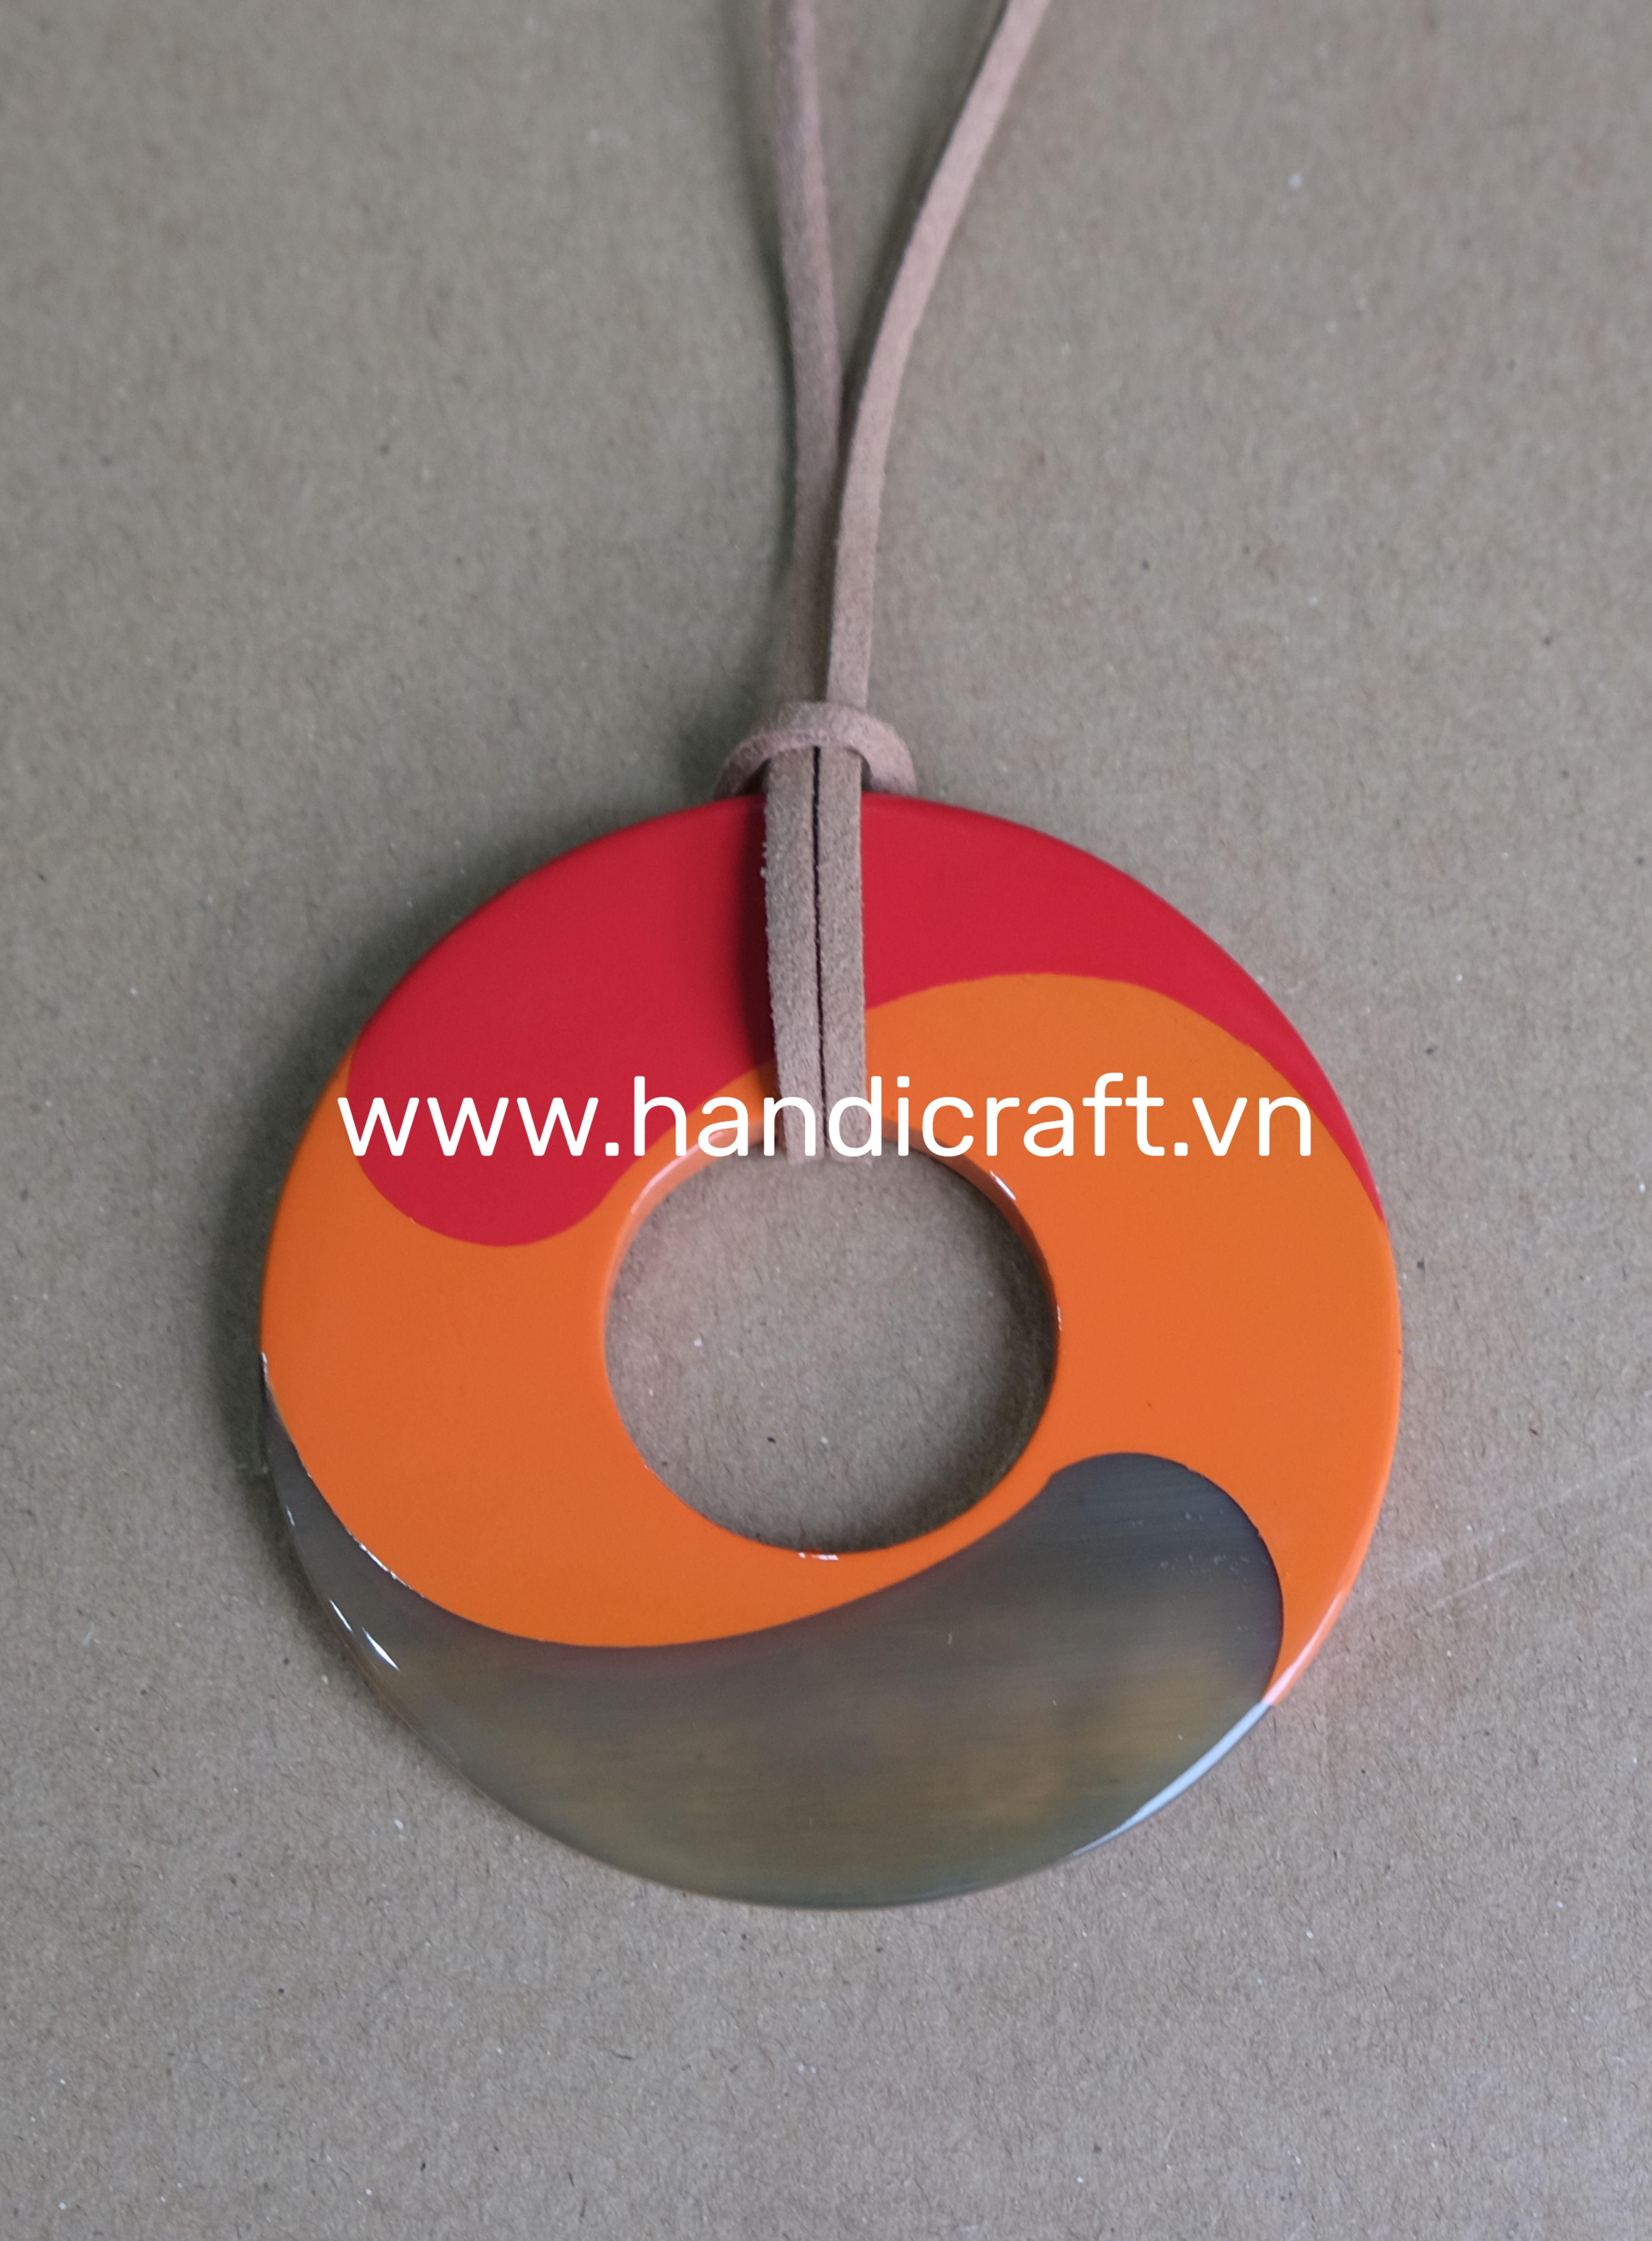 Buffalo horn handmade pendant, handmade by skillful